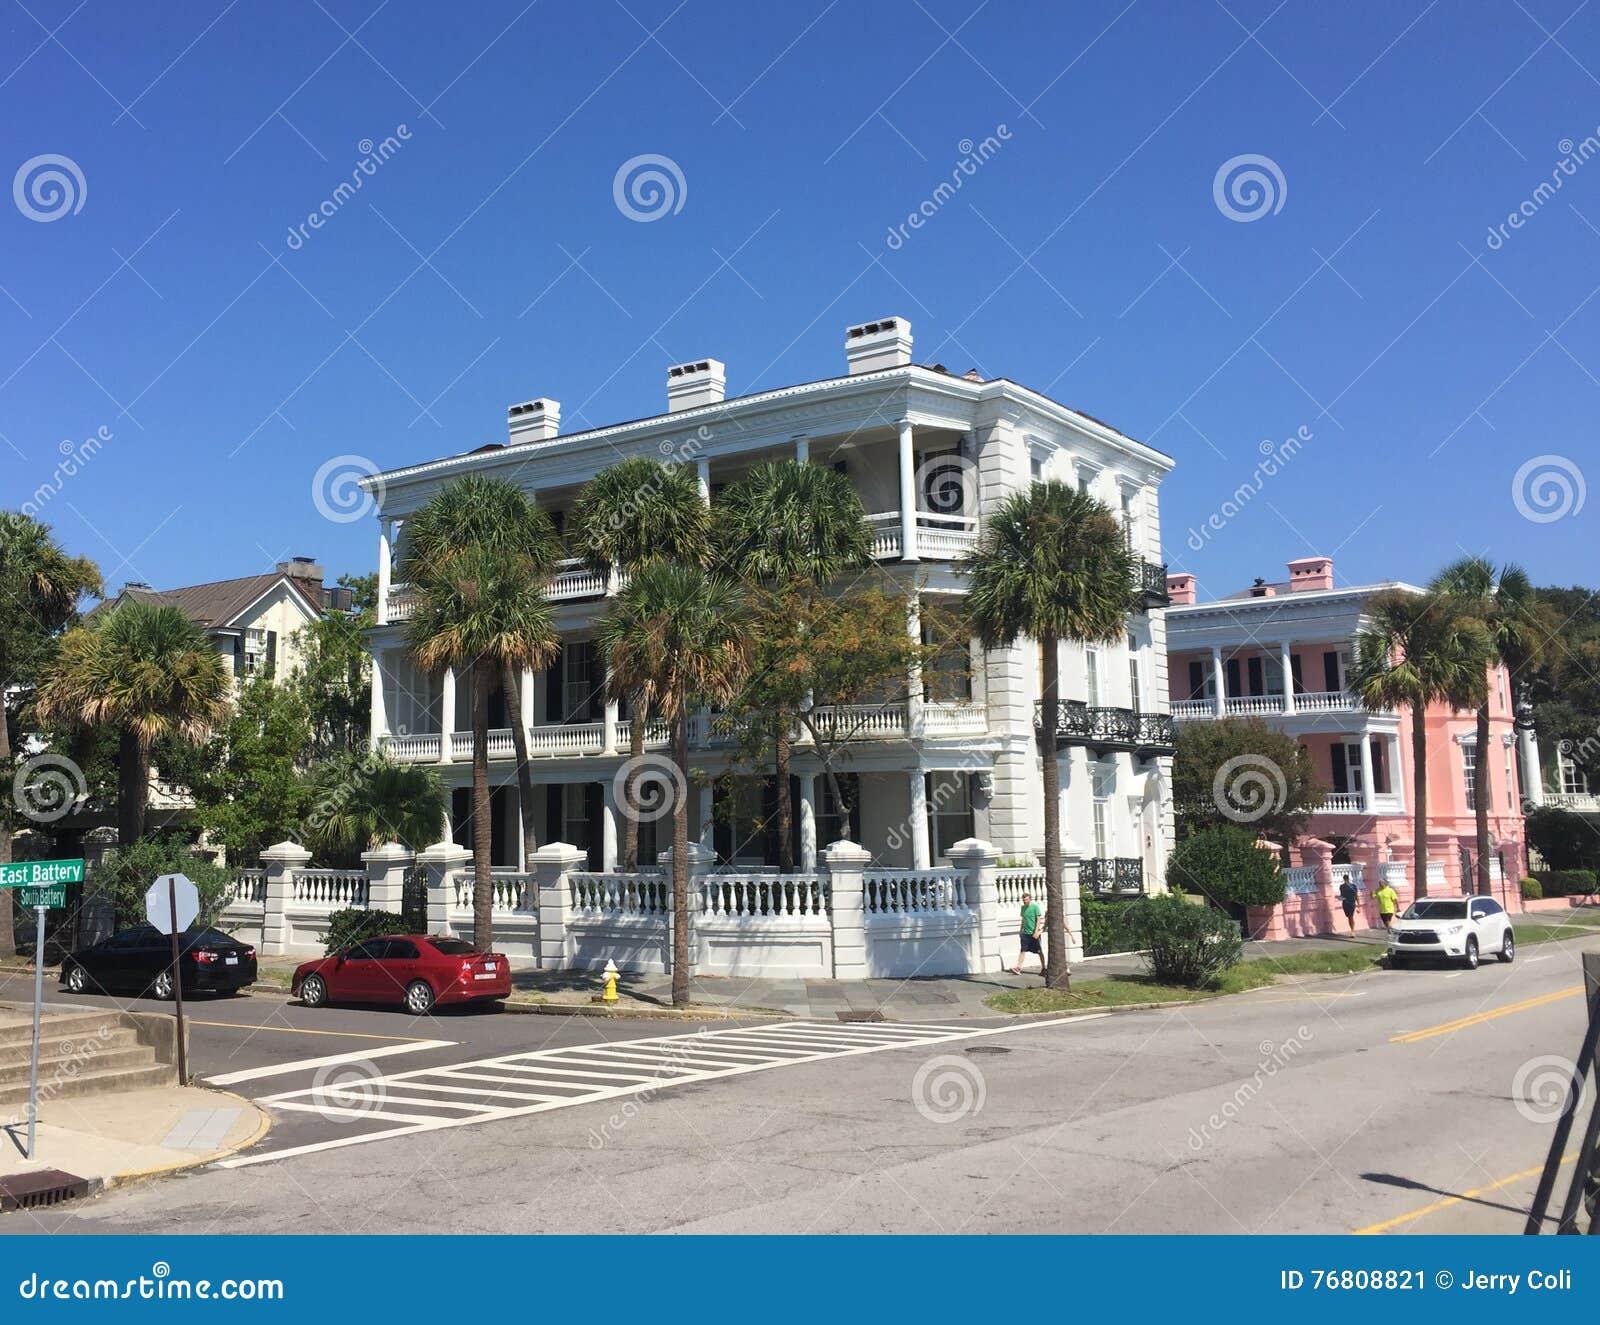 Charleston Sc Homes: Historic Homes On East Bay St, Charleston, SC. Editorial